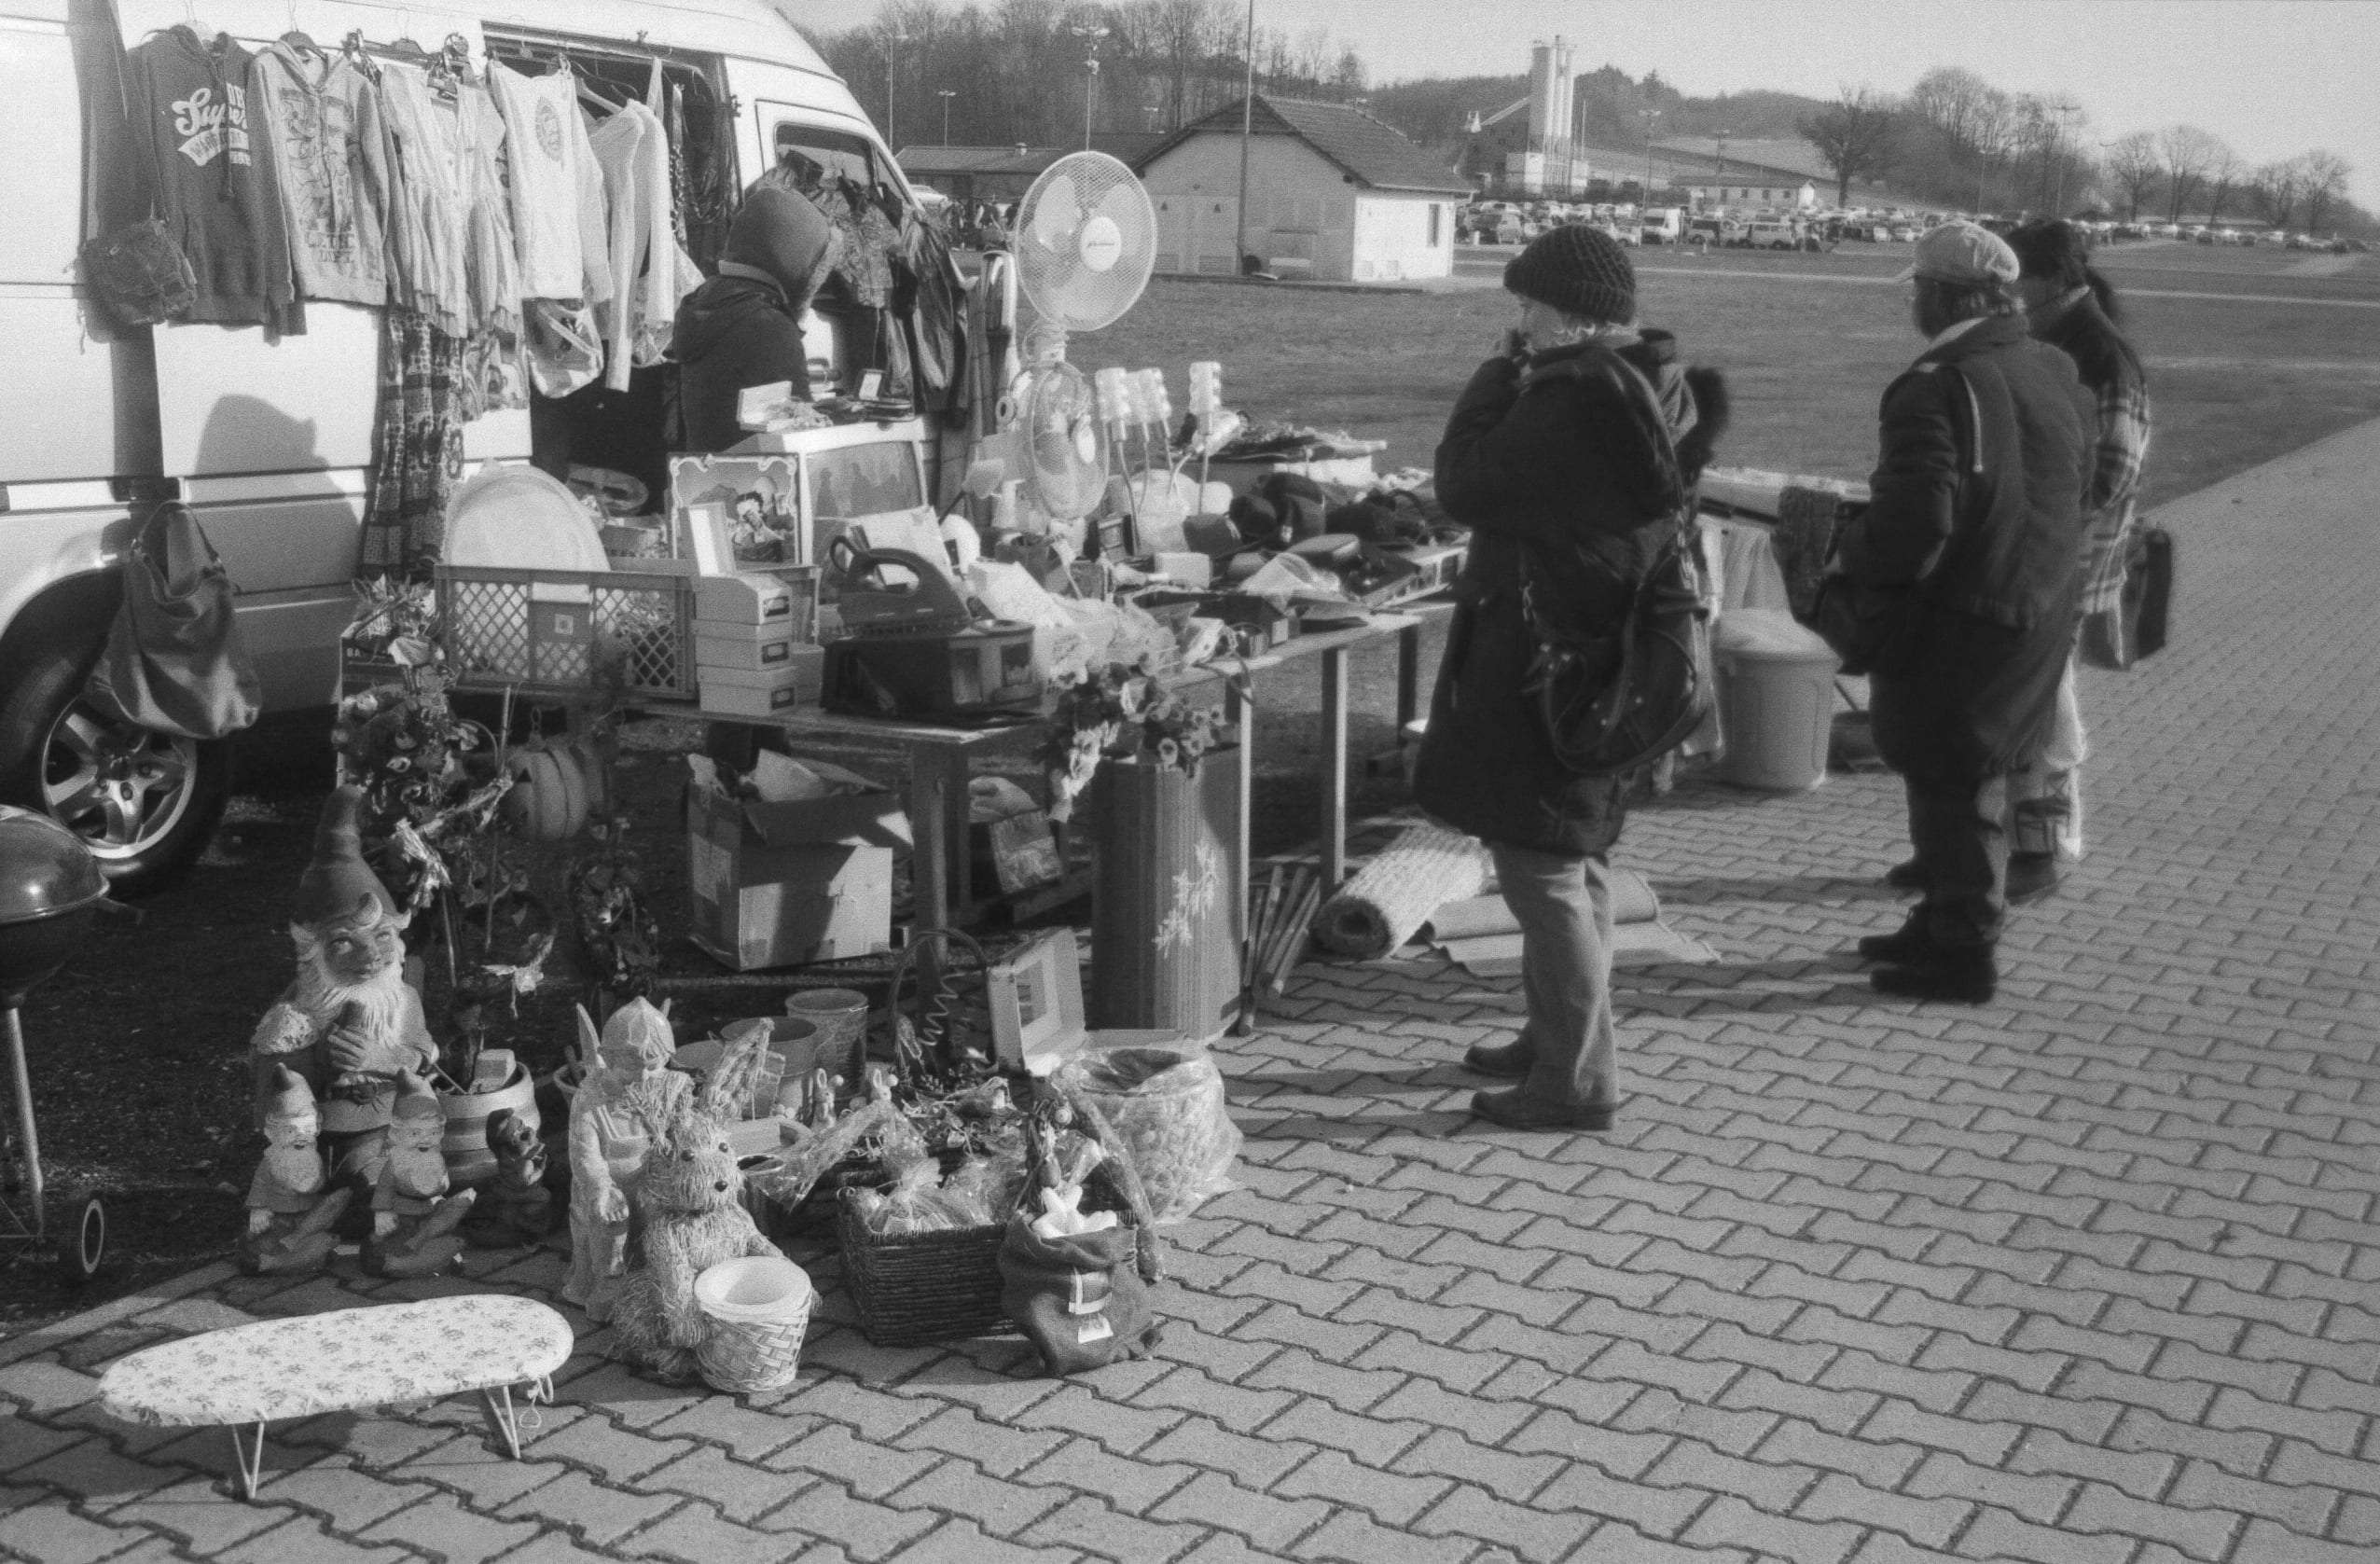 Flea Market February 3